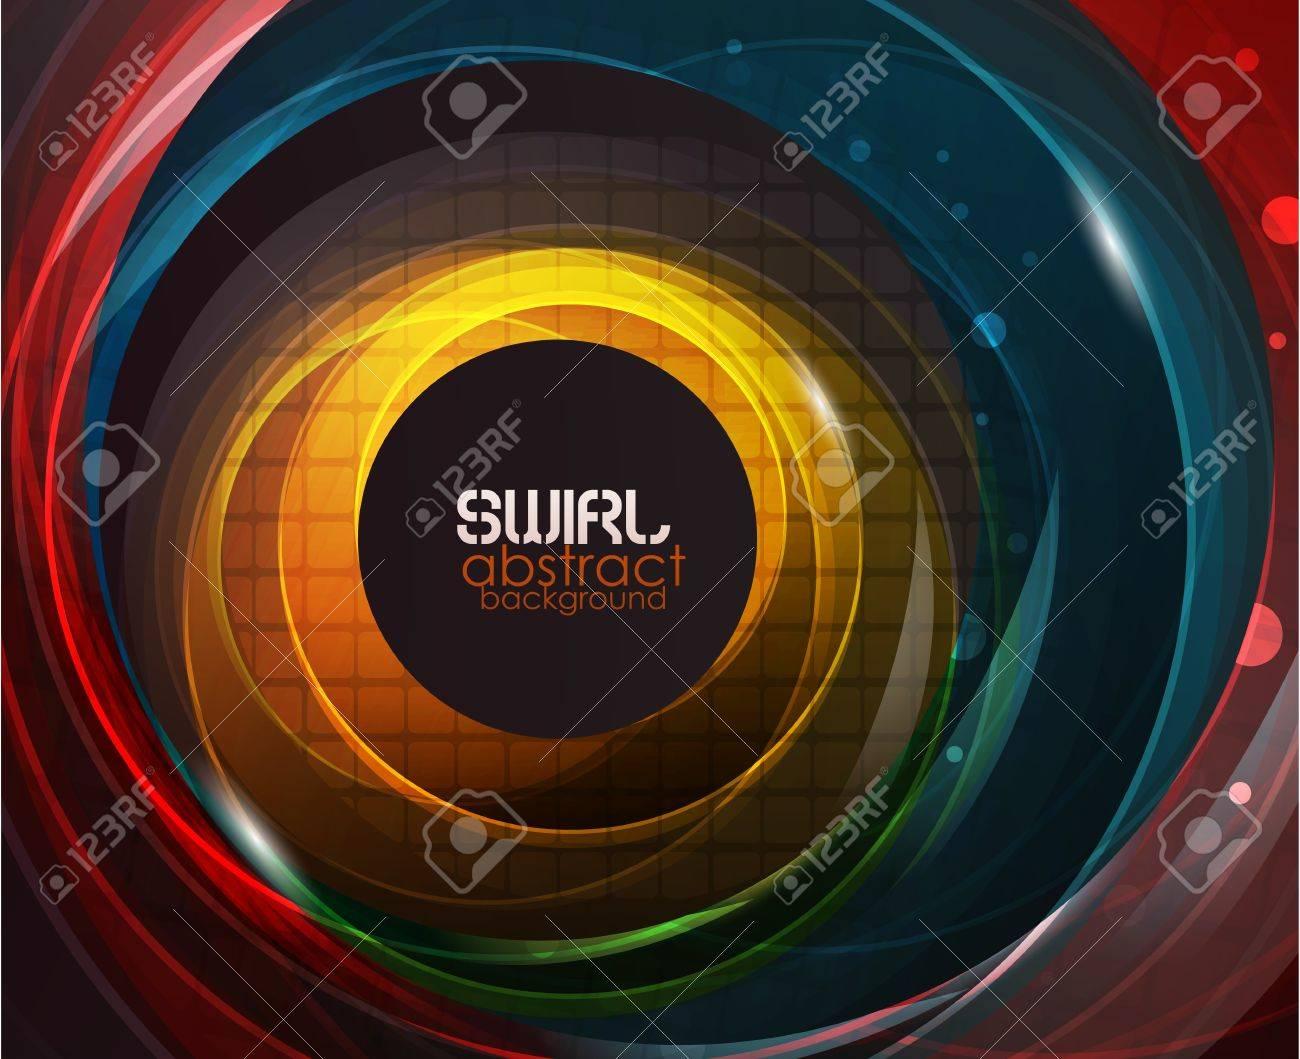 Swirl vector abstract background Stock Vector - 10658337